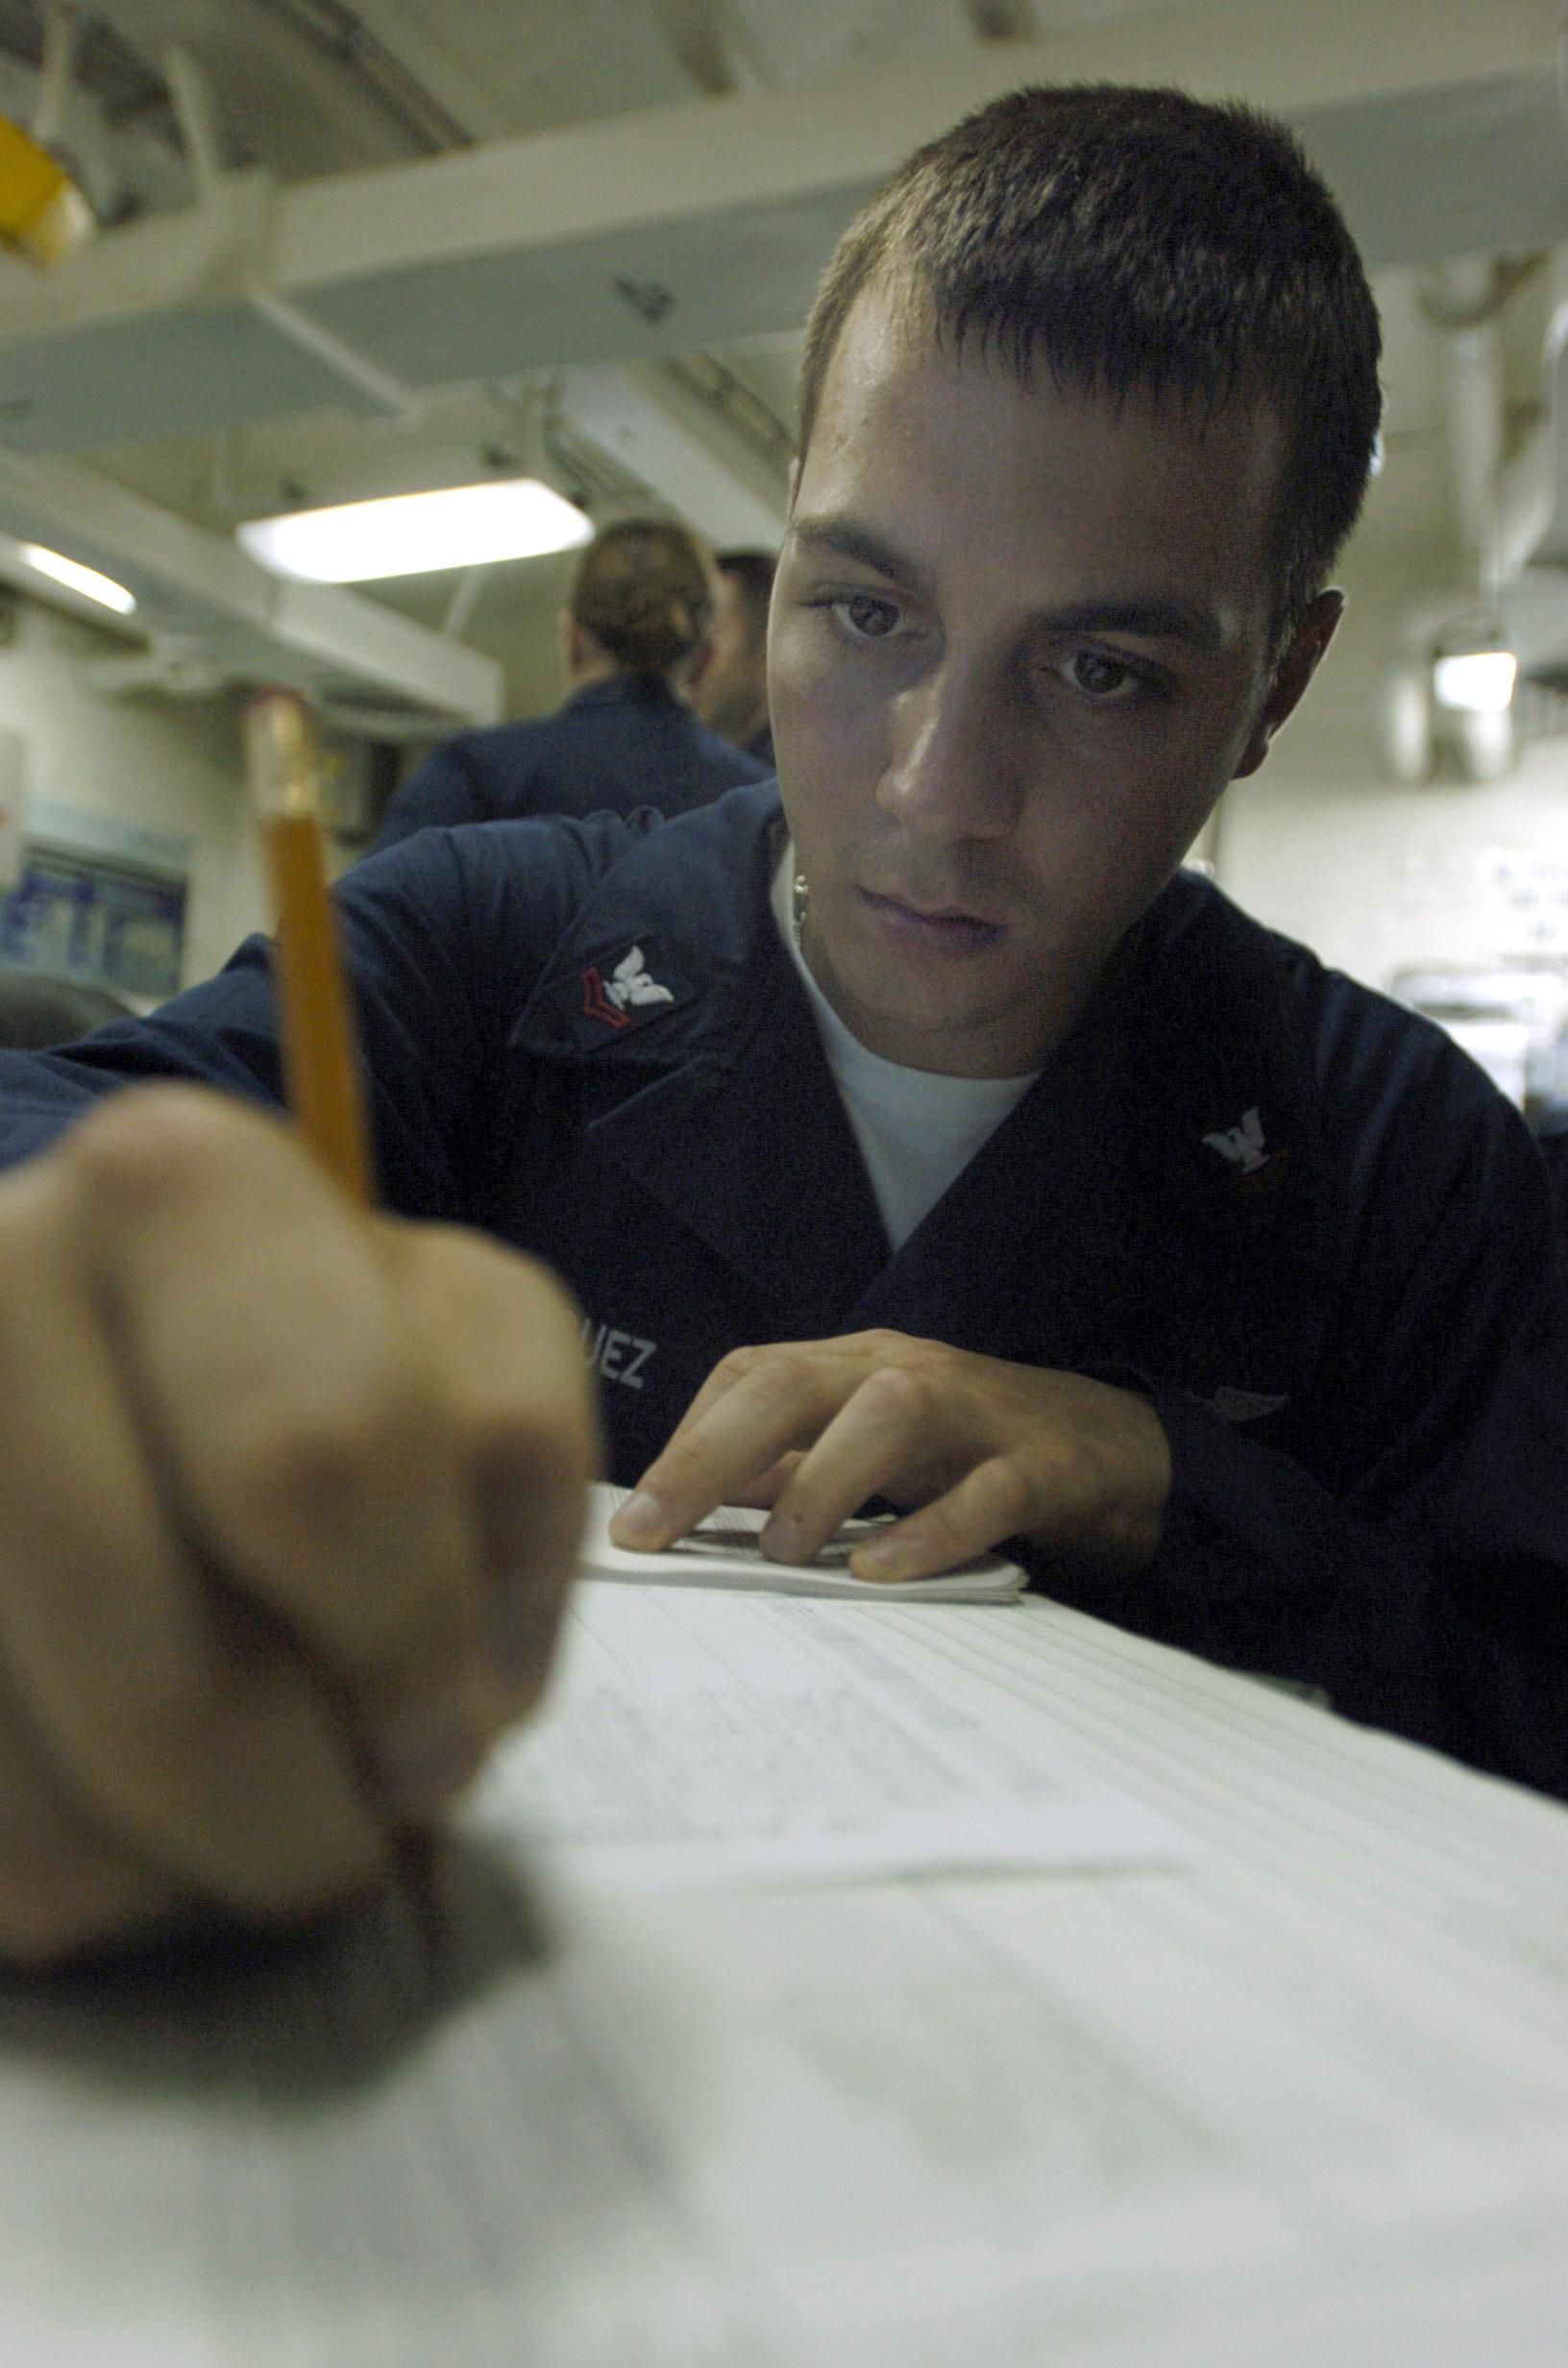 File:US Navy 080618-N-1038M-038 Aerographer's Mate 2nd Class